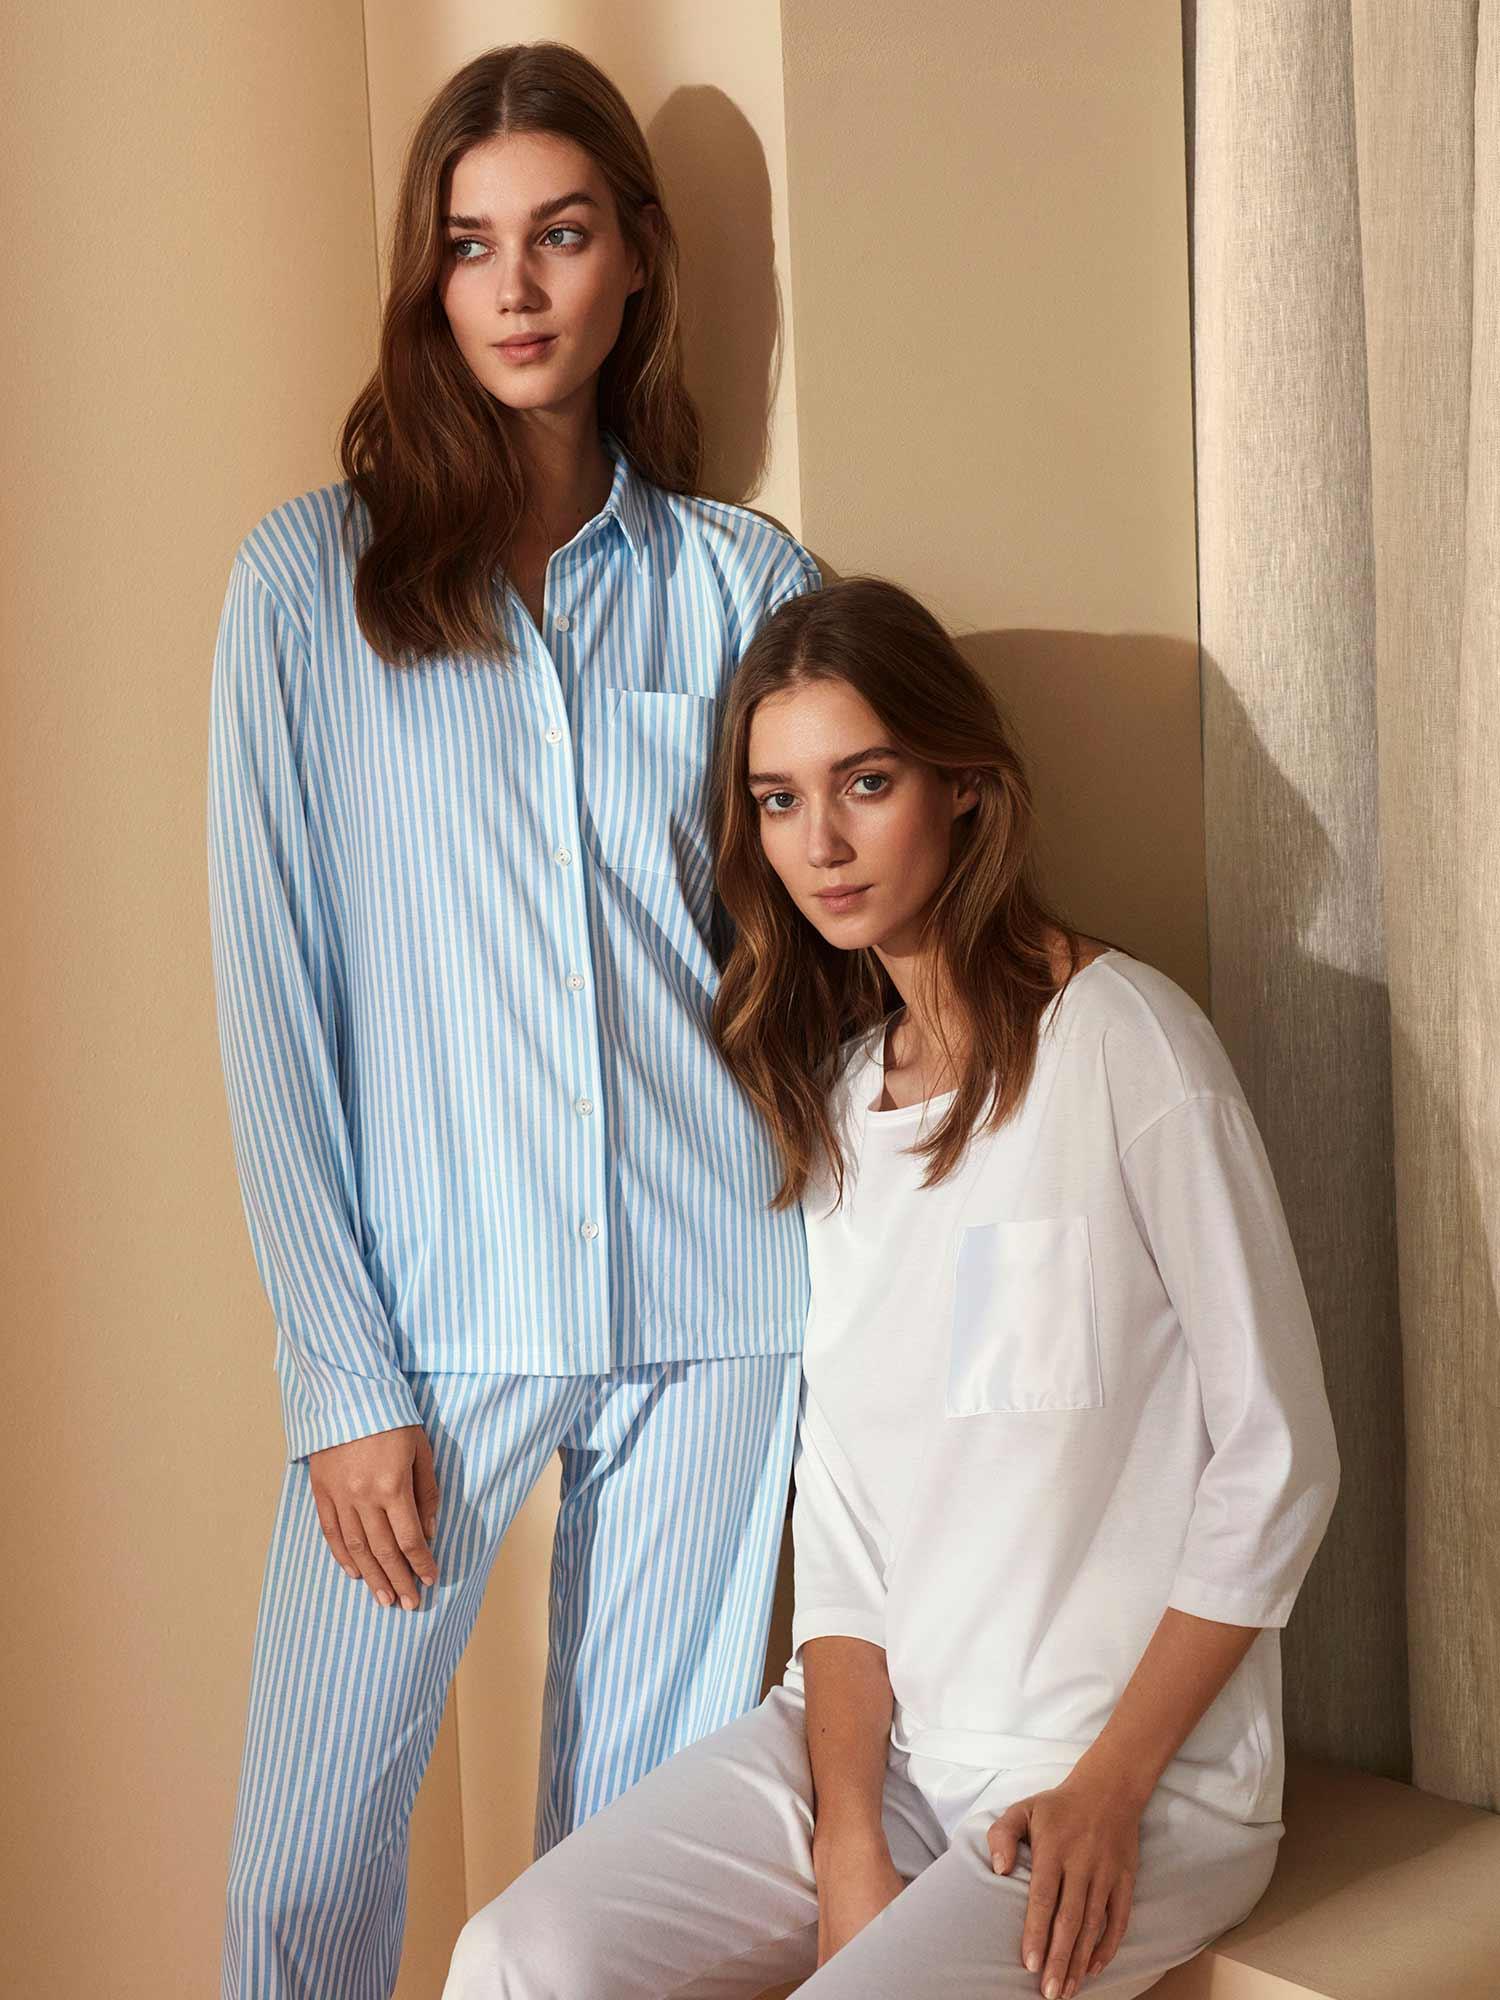 Comfortabele nightwear voor dames | mey®